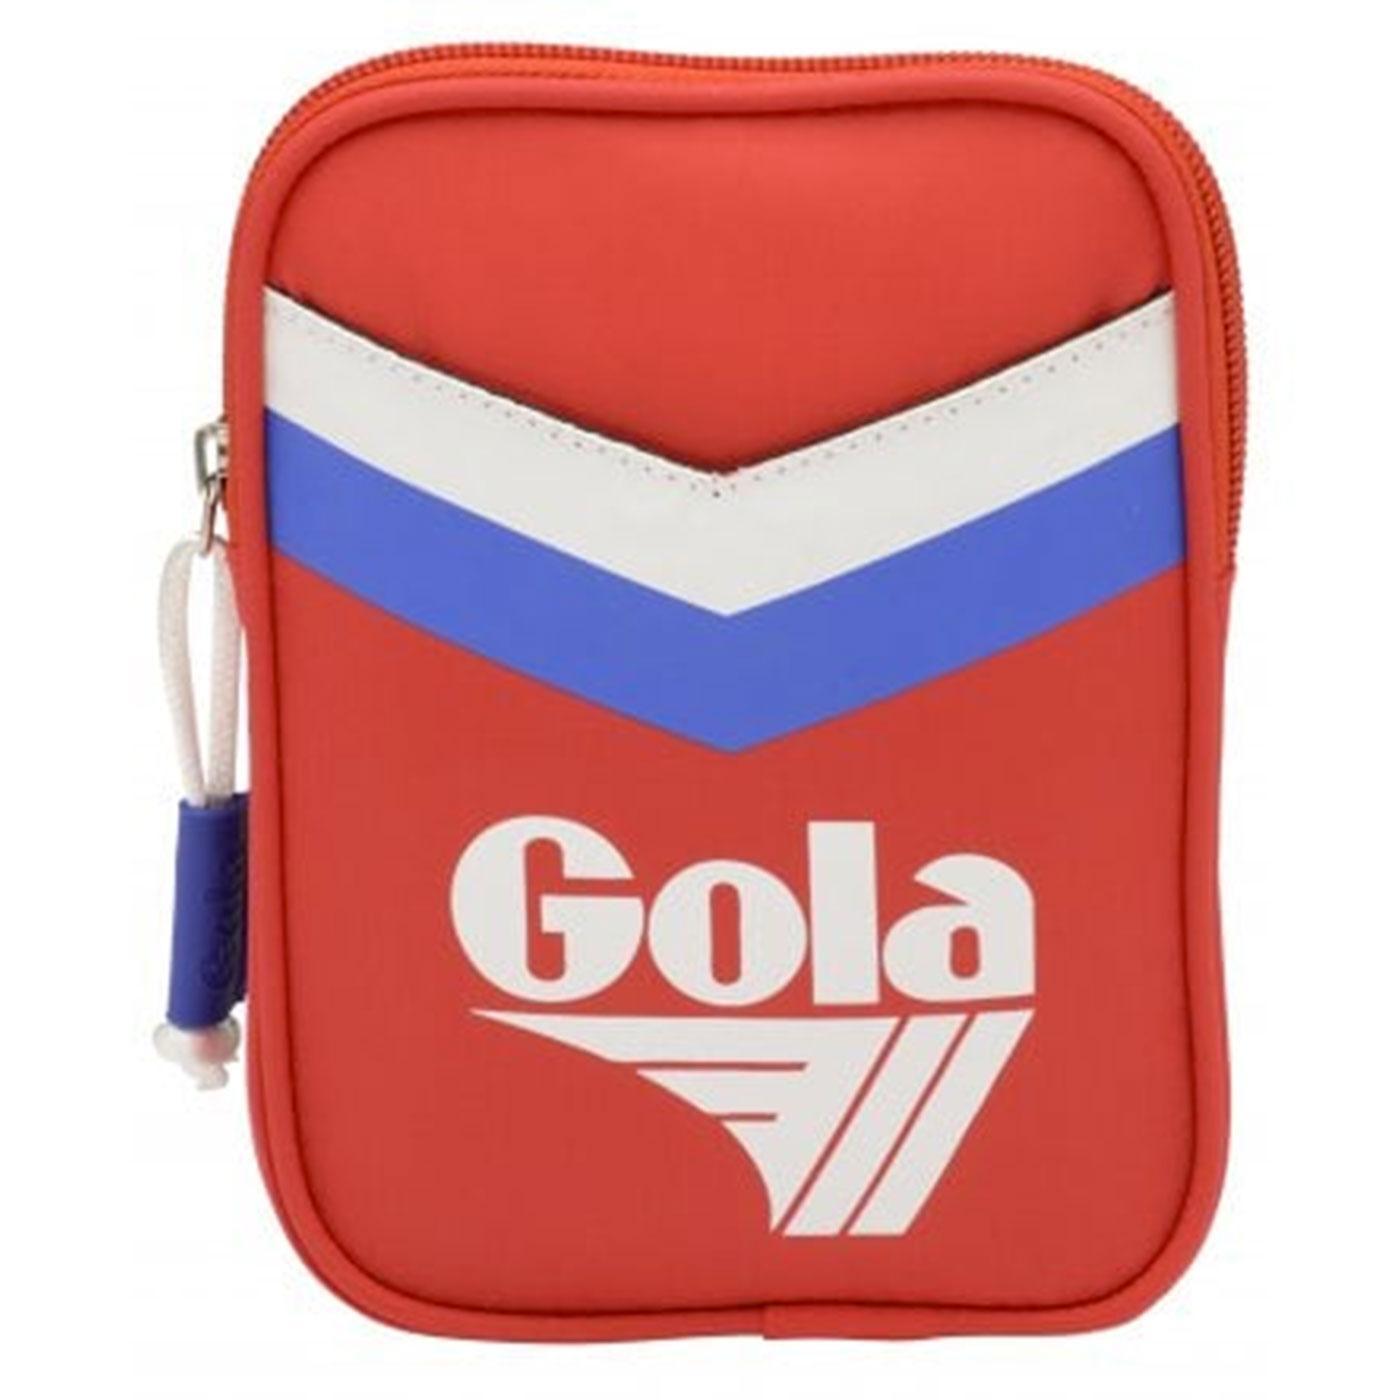 Goodman Chevron GOLA Retro Micro Pocket Bag (R/B)